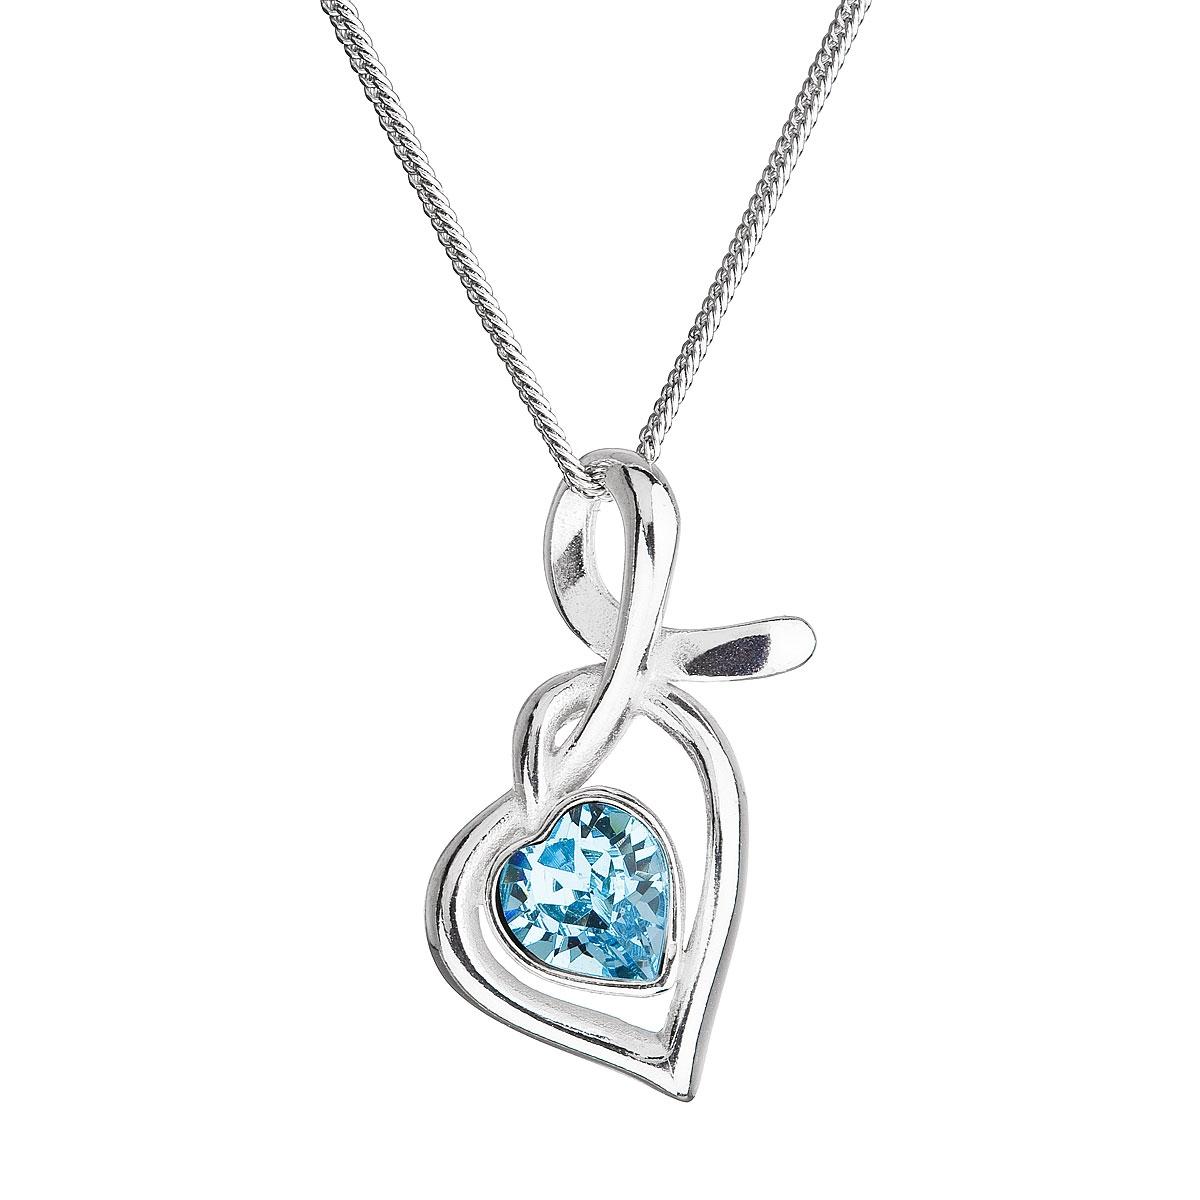 Stříbrný náhrdelník se Swarovski krystalem EG4256-Q